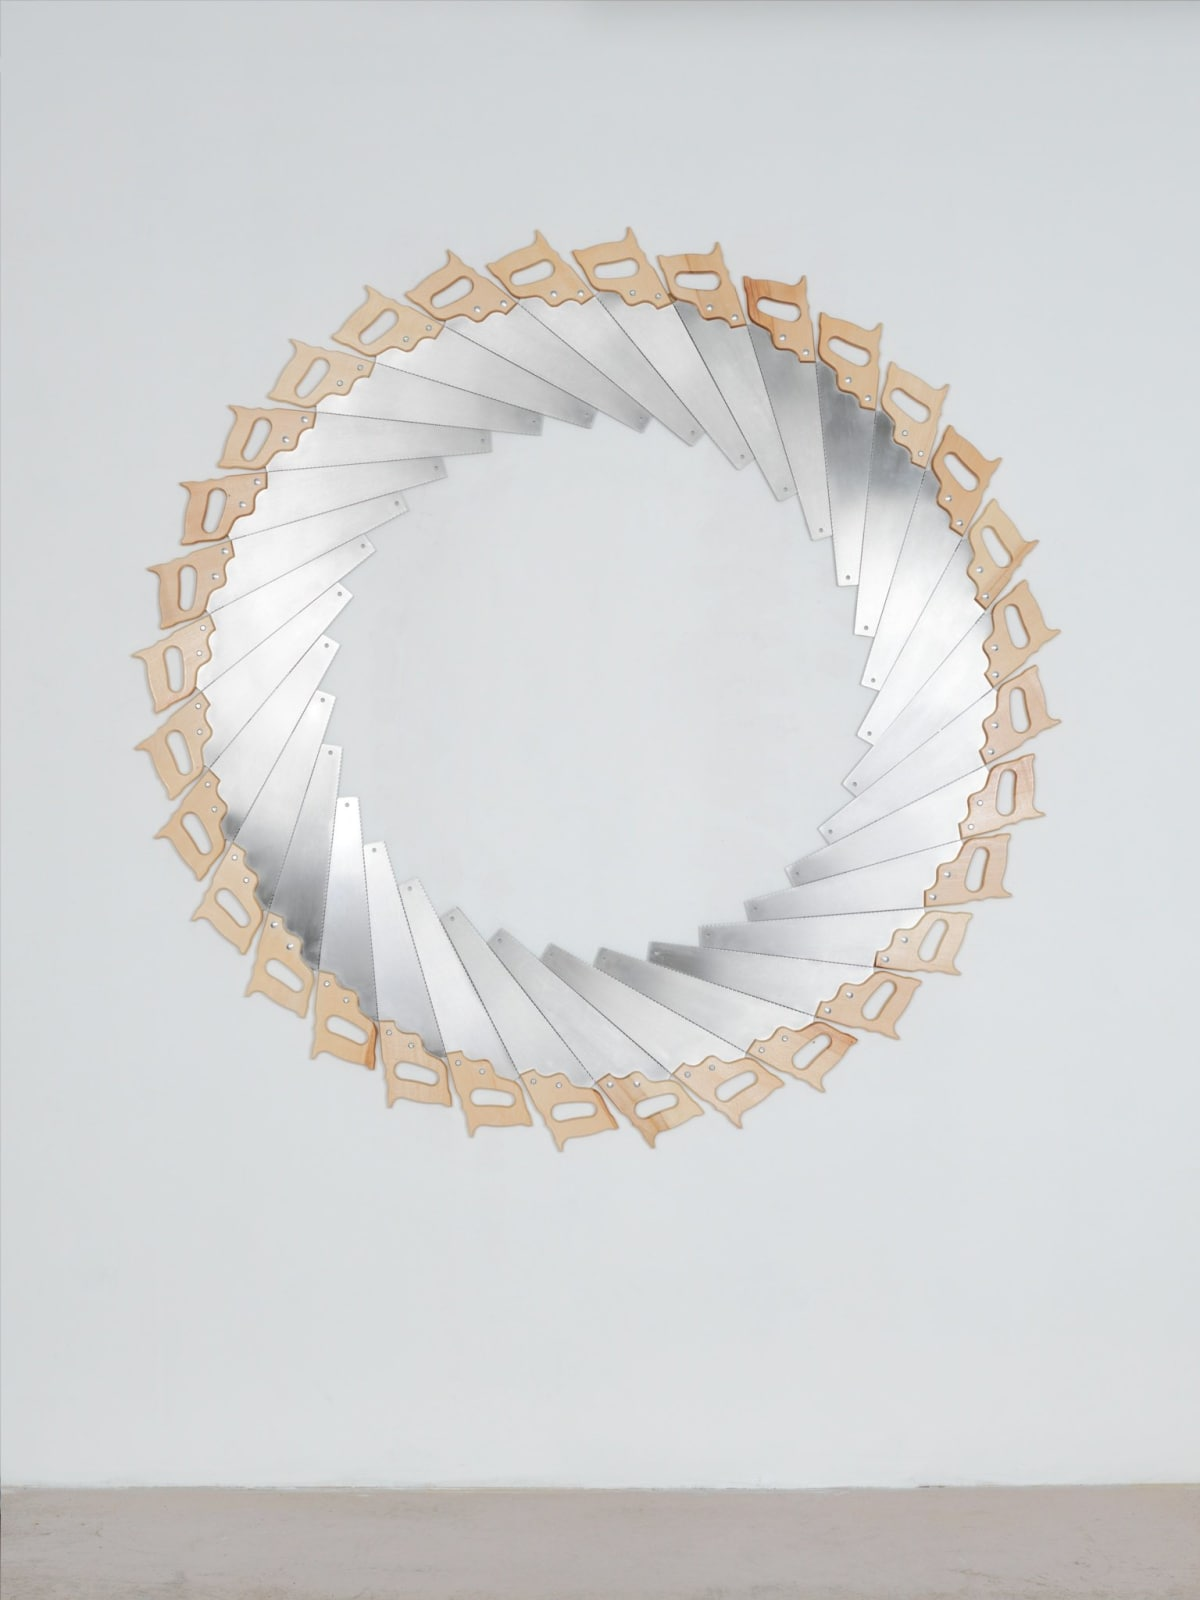 Jacob Dahlgren, Untitled Endless Cut, 2012